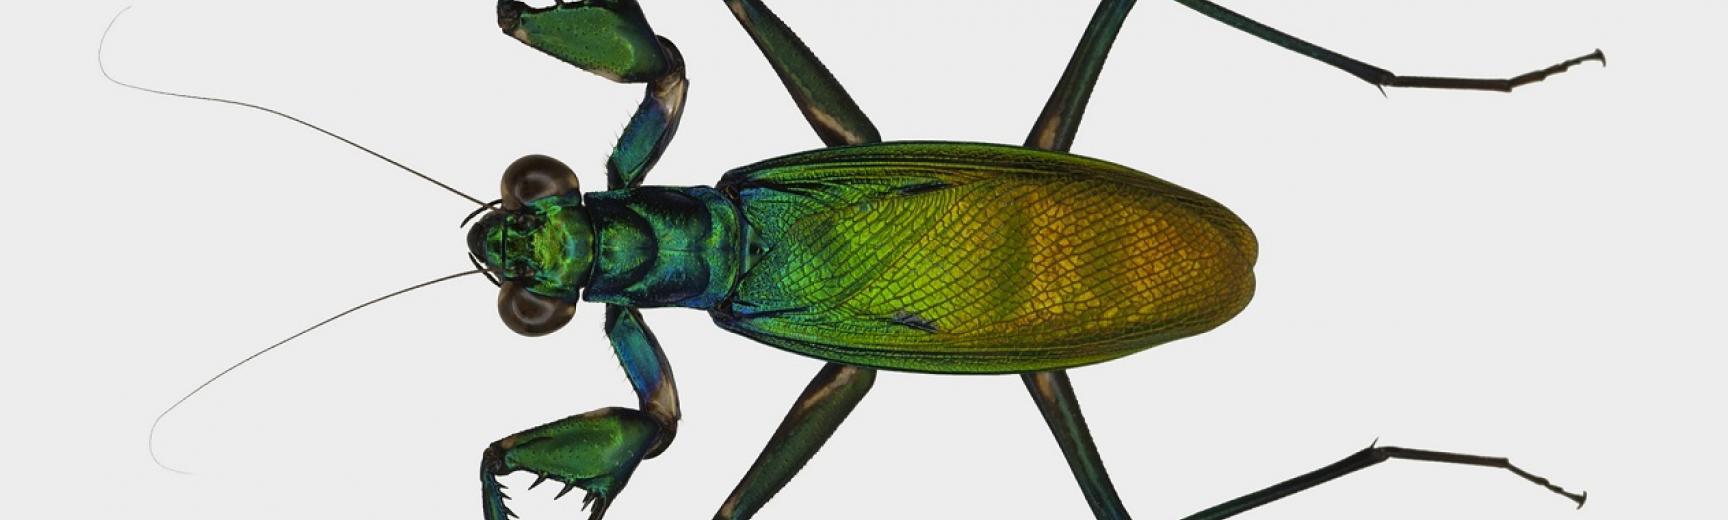 Metallyticus splendidus mantis